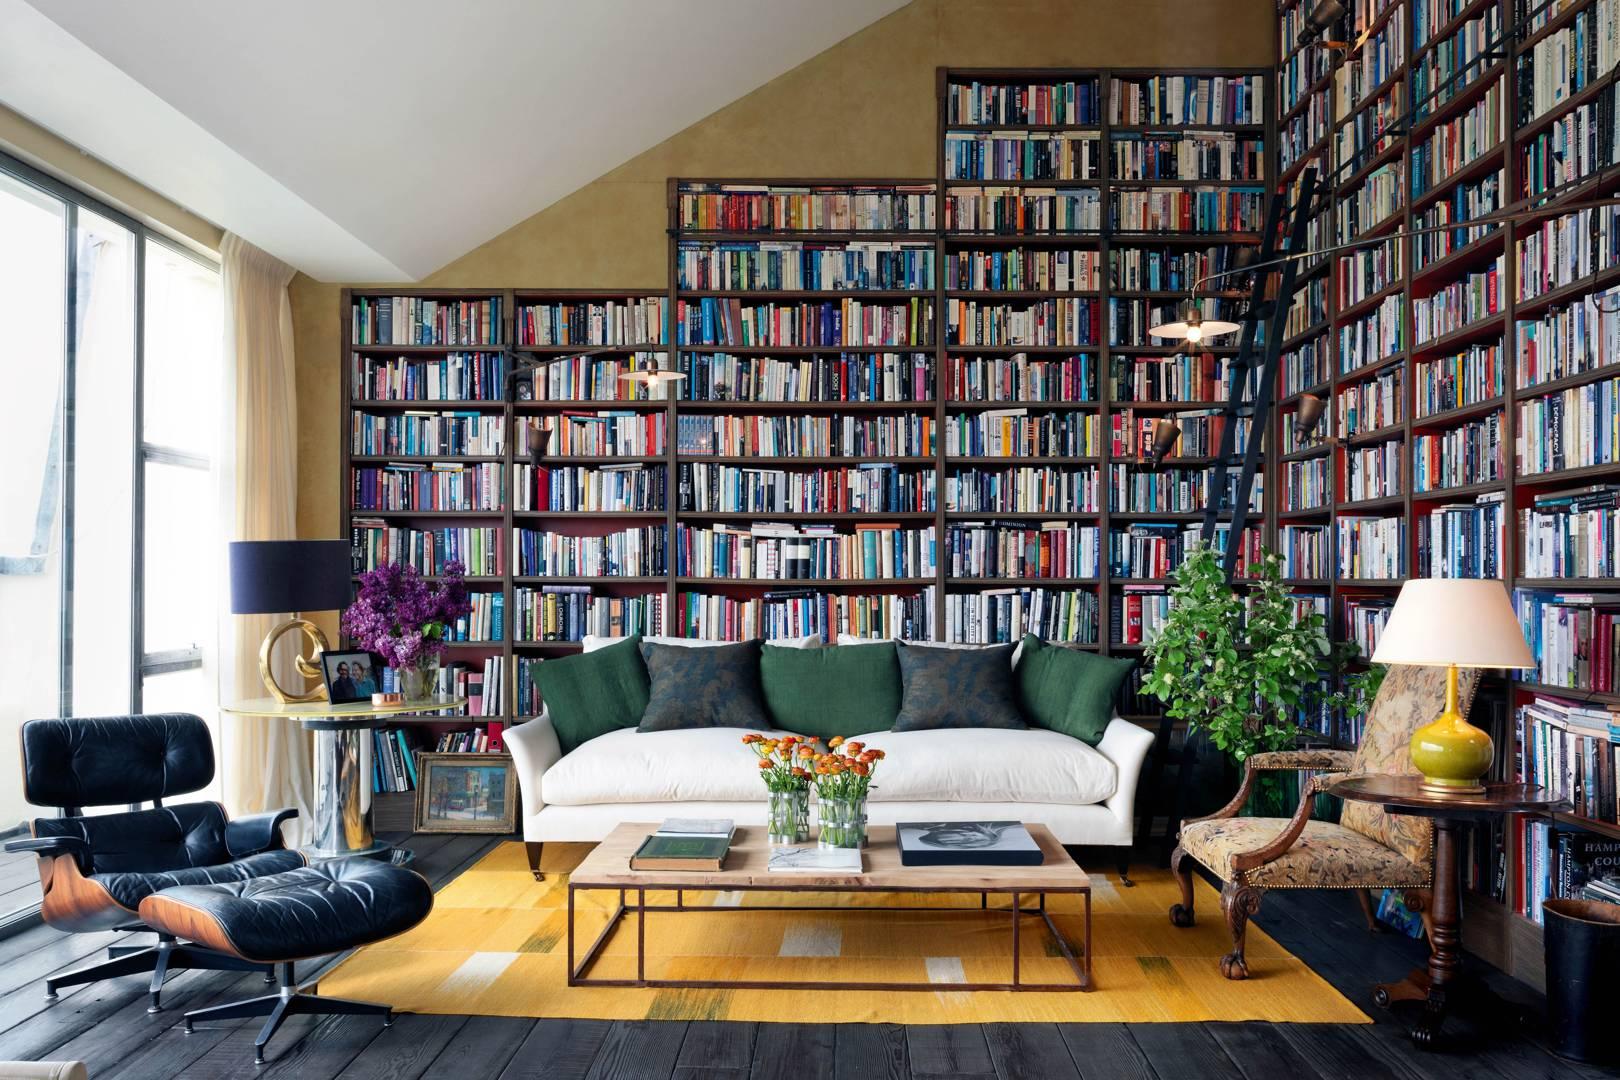 Co colour coordinated bookshelf - Co Colour Coordinated Bookshelf 45